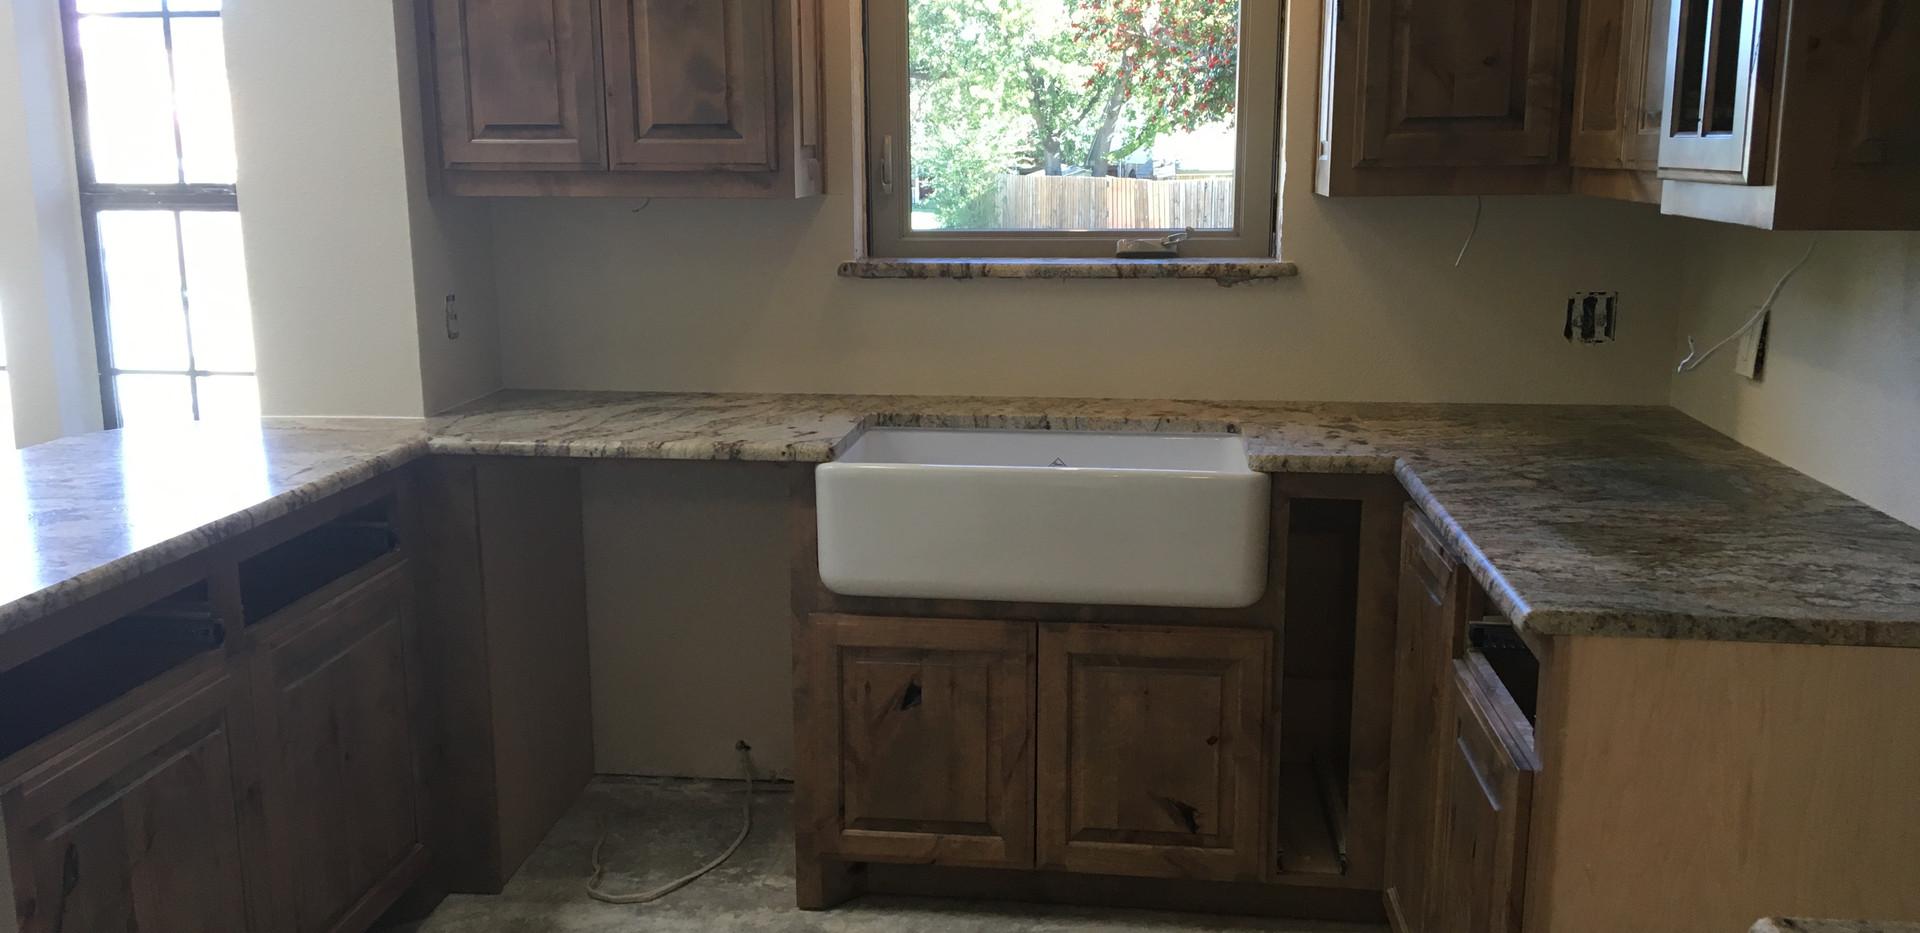 granite_rustic_countertop_kitchen_sink.J